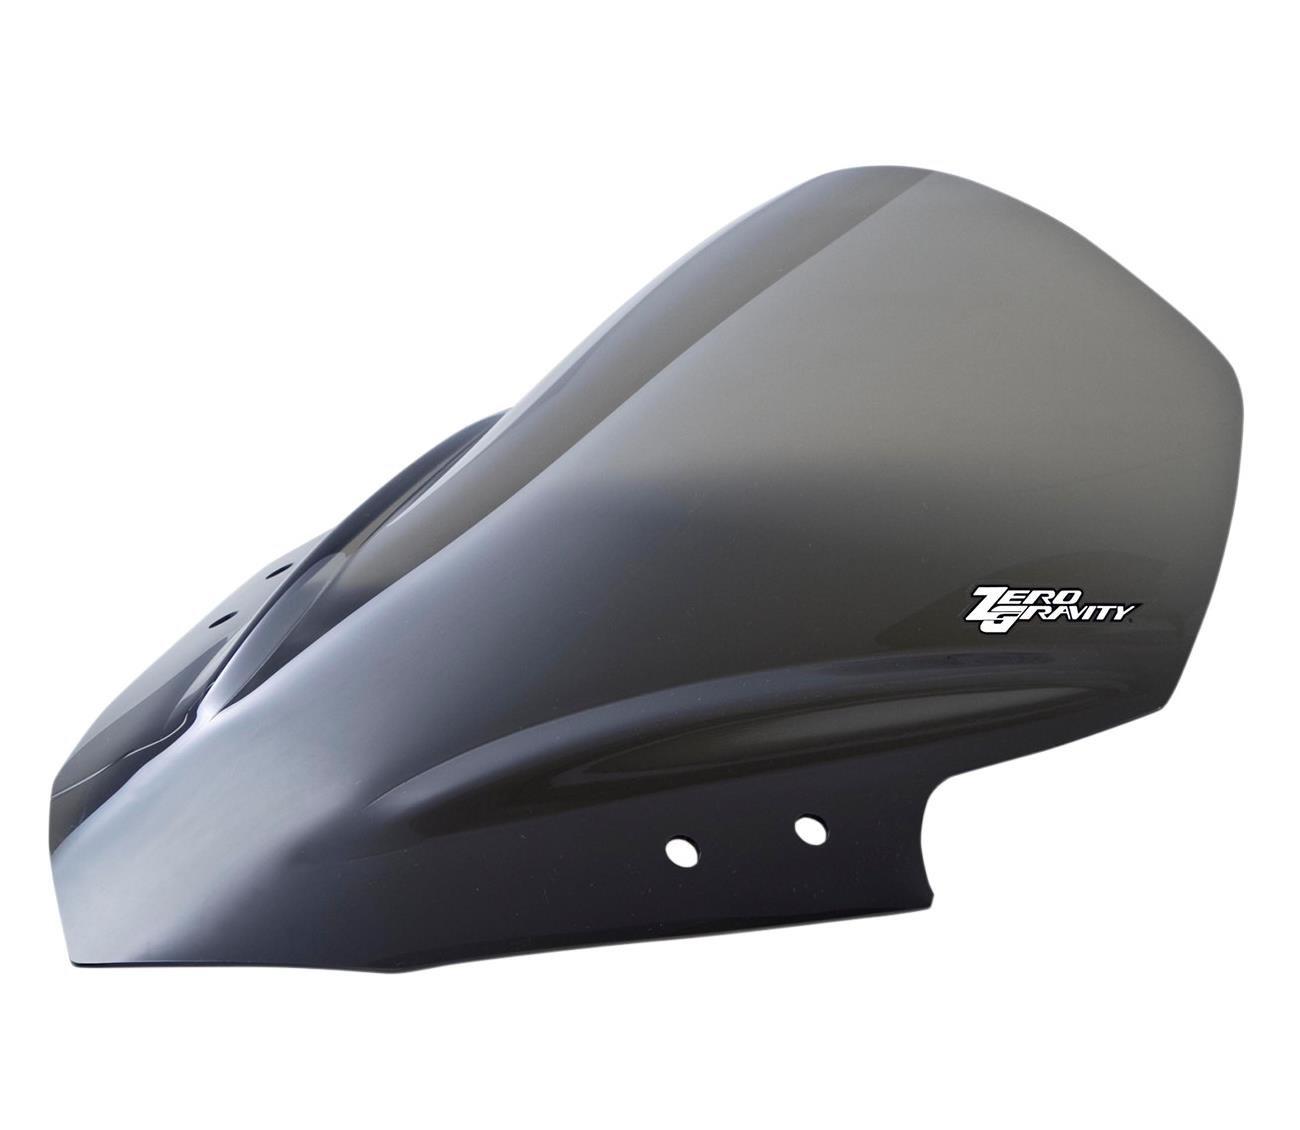 Zero Gravity Sport Touring Windscreen - Smoke 23-282-02